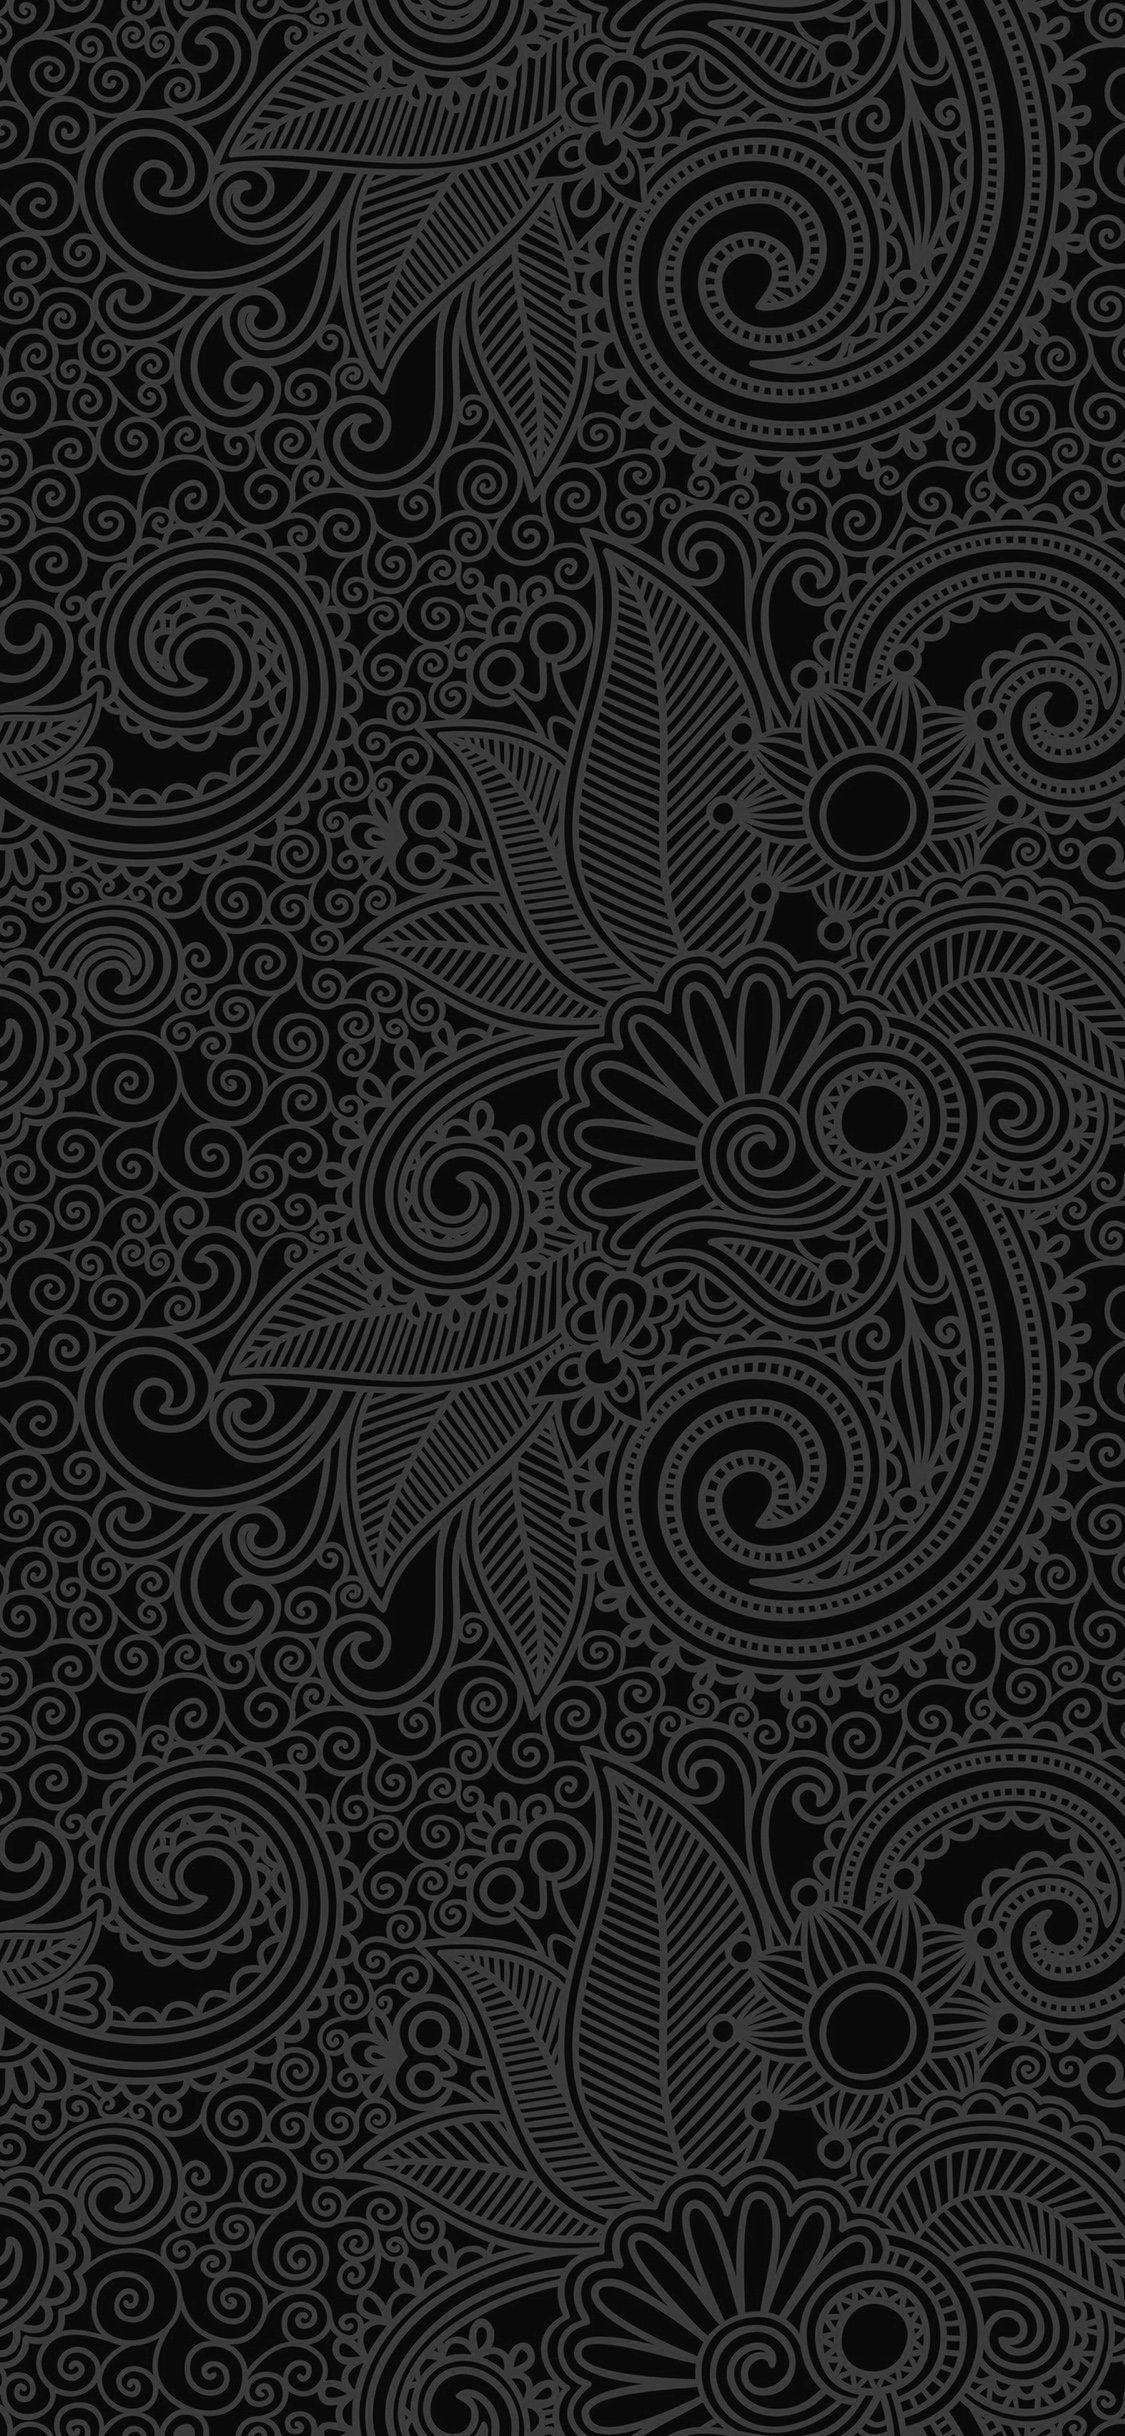 Face Pattern Background Bw Dark Iphone X Wallpaper Black Wallpaper Iphone Black Wallpaper For Mobile Jellyfish Wallpaper